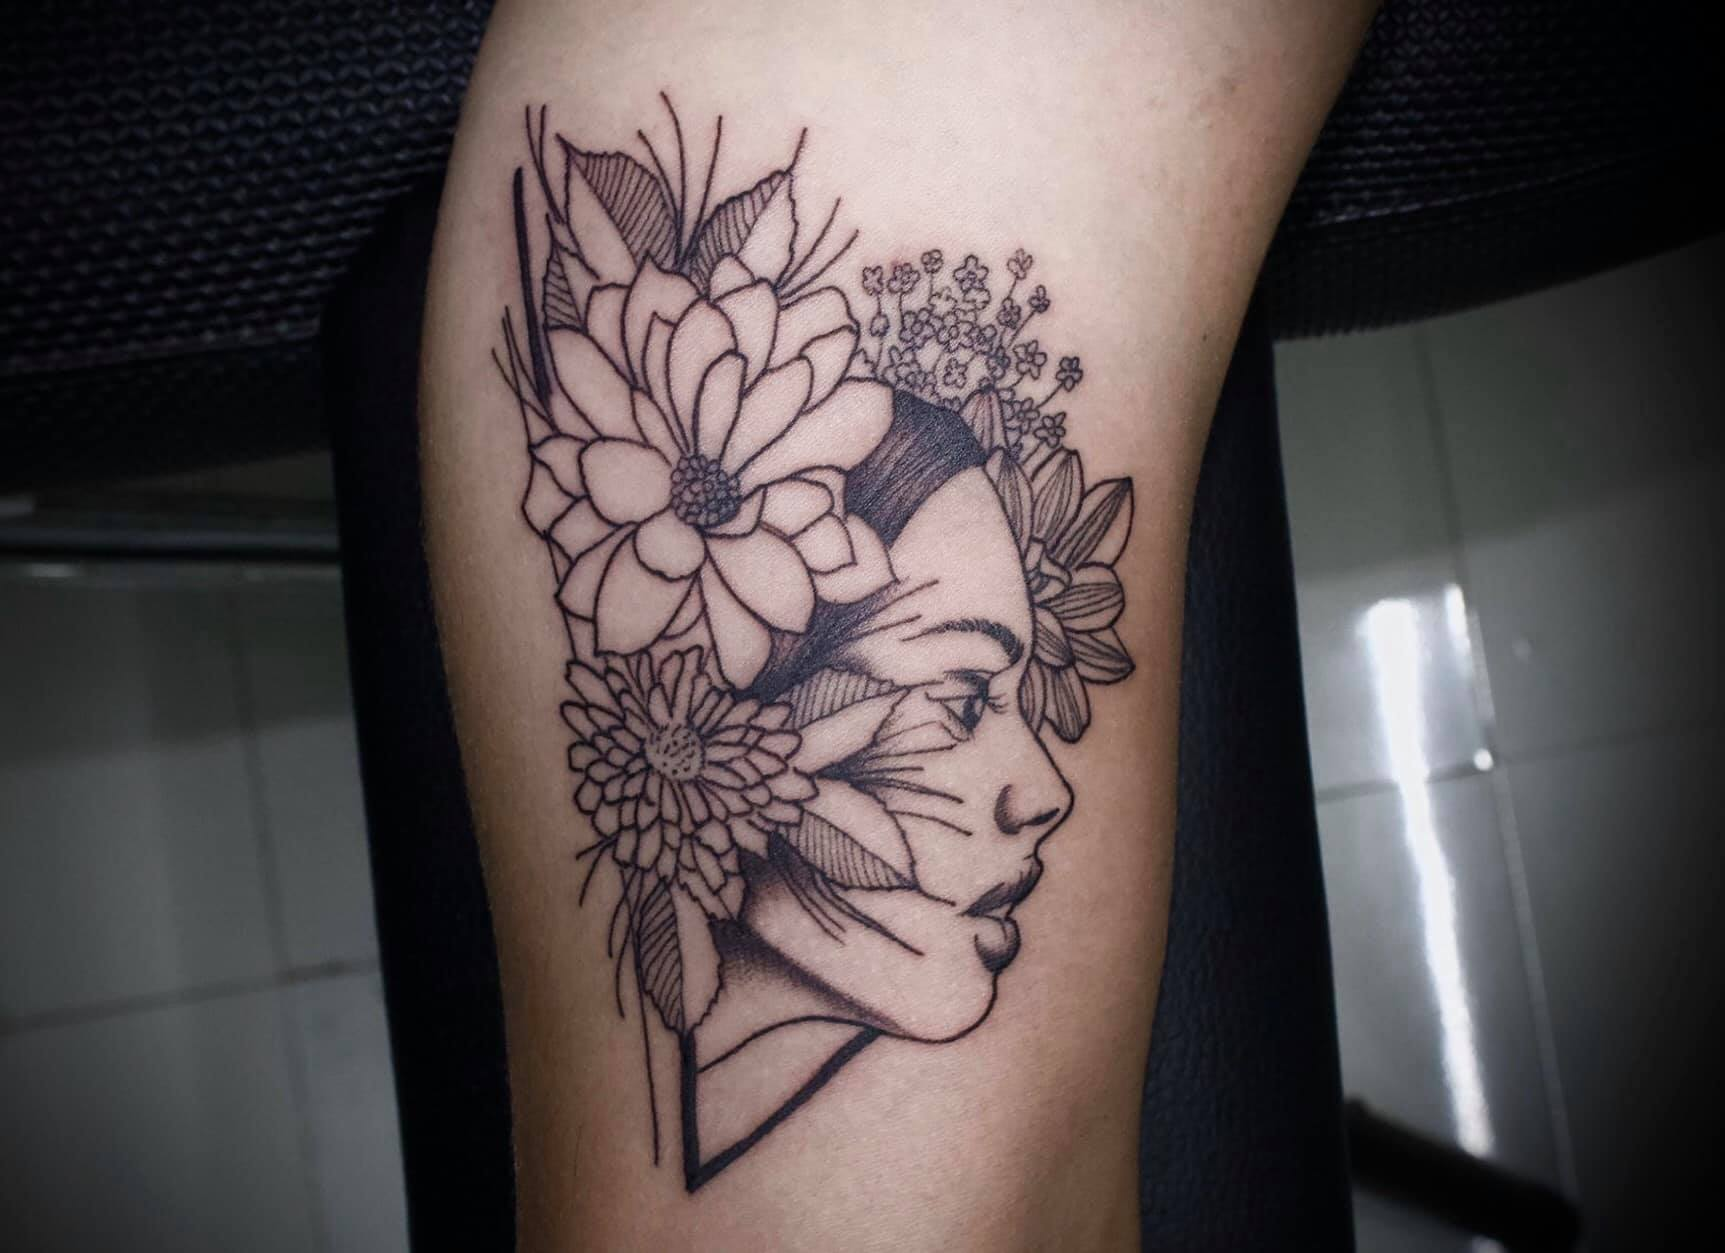 Tatuajes aesthetic en blanco y negro 27